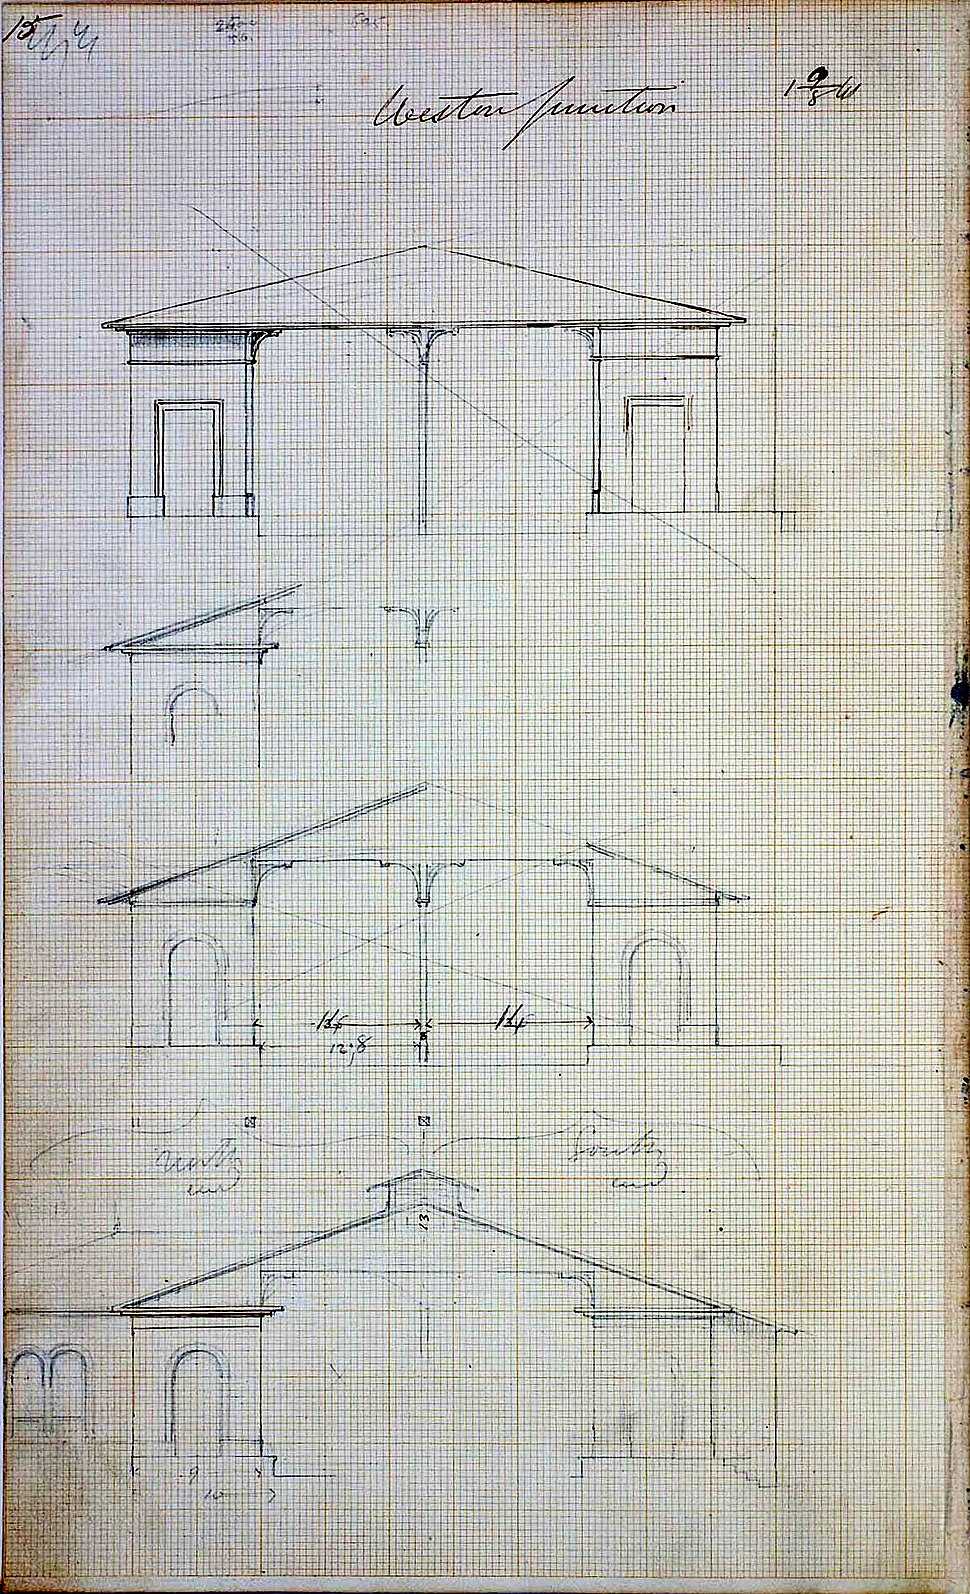 Weston Junction Station - drawing by Isambard Kingdom Brunel